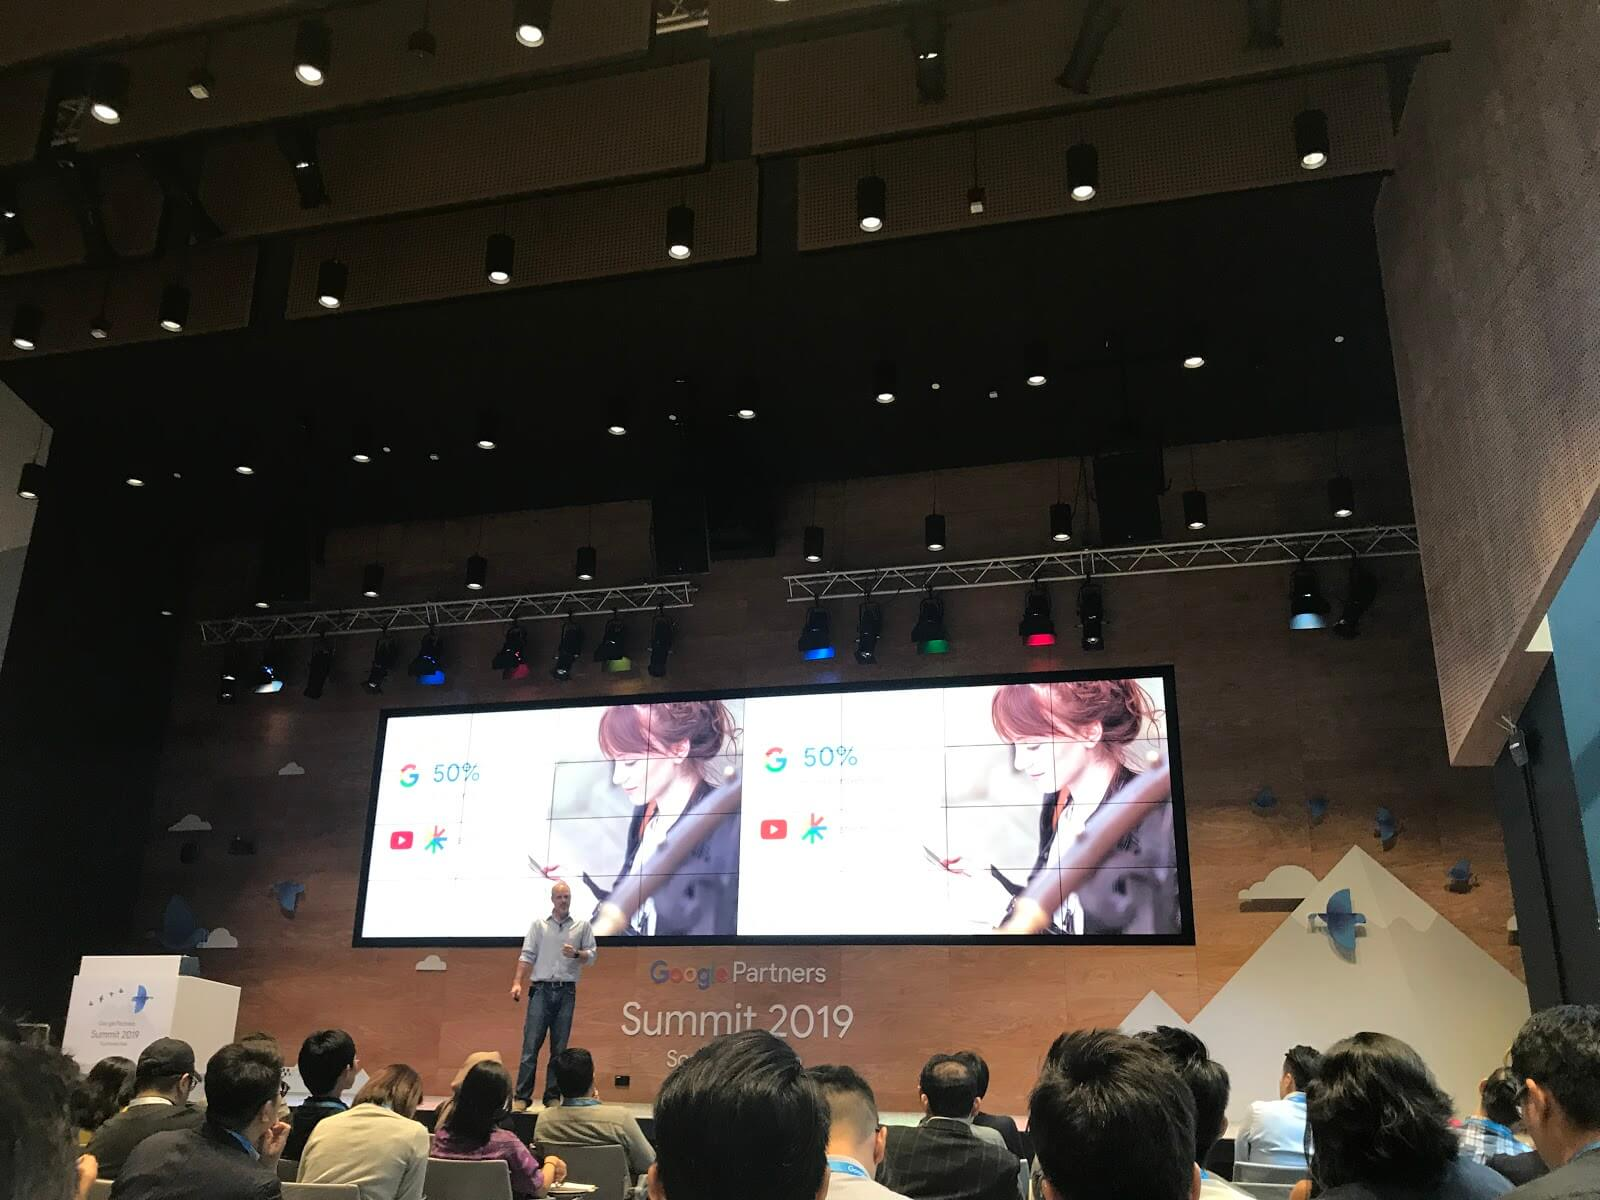 Google-Summit-2019-nói-về-Audience-expansion